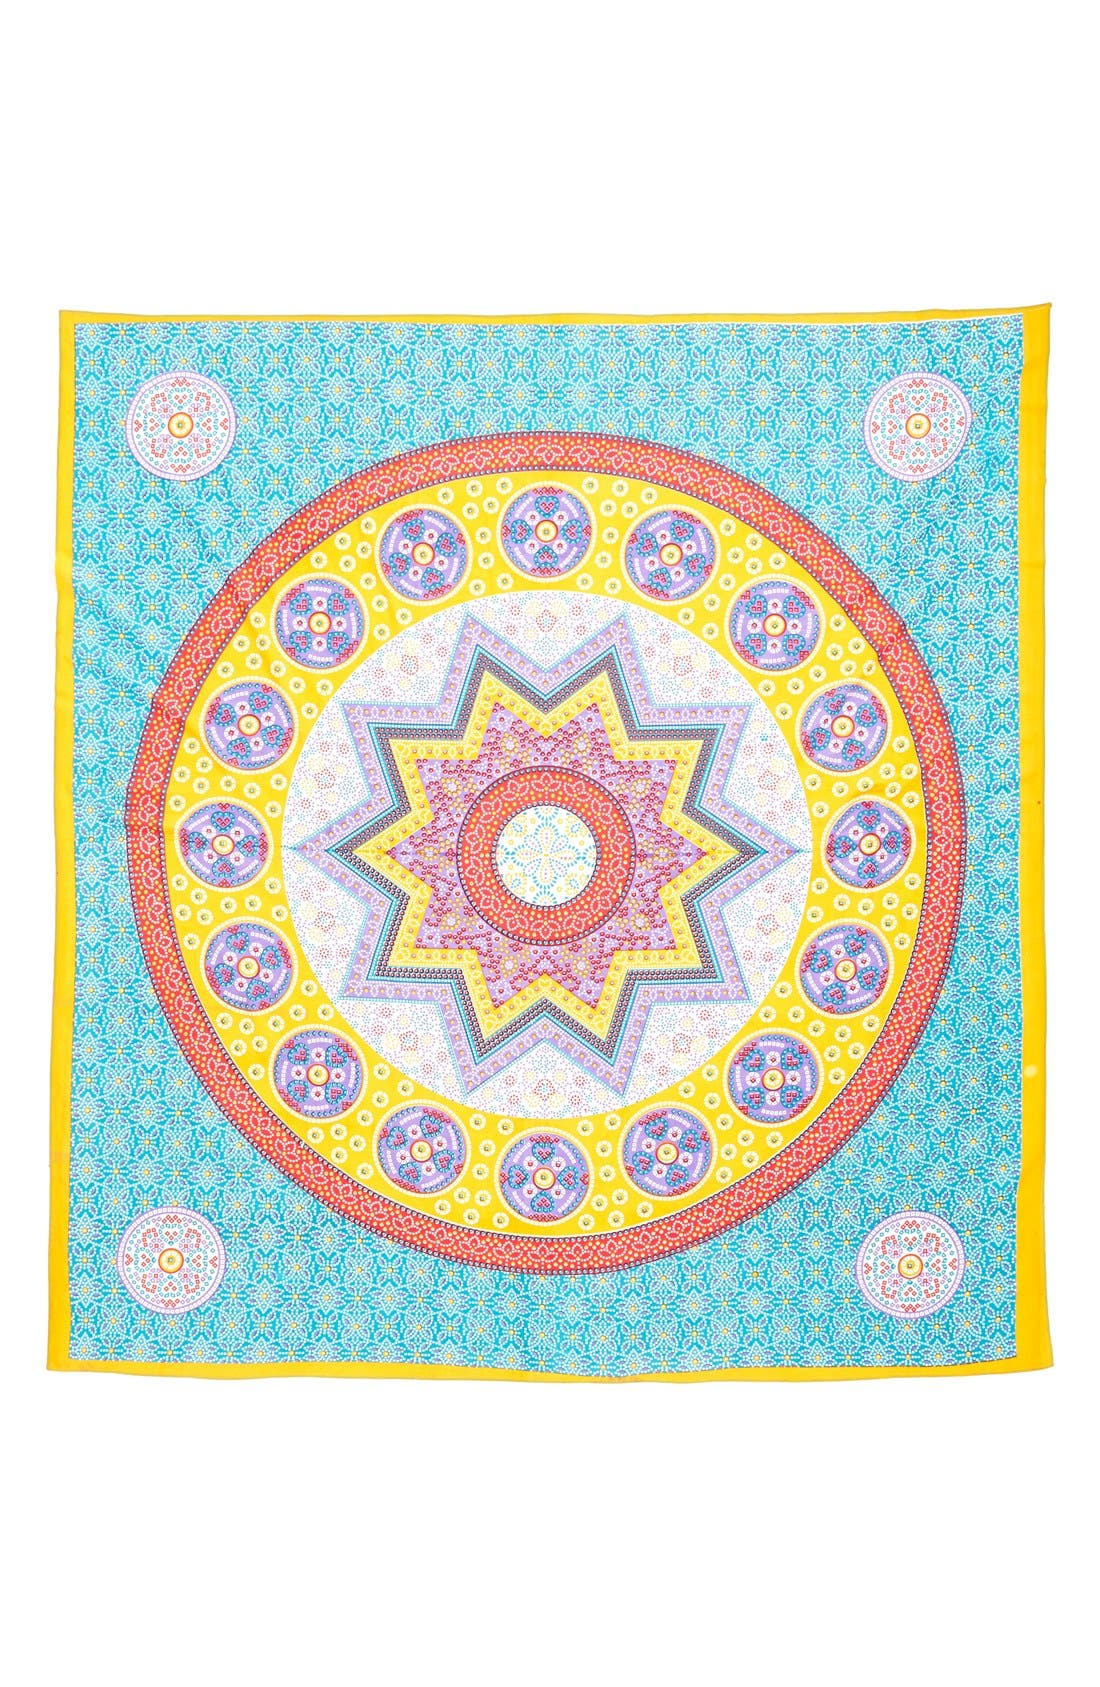 Alternate Image 1 Selected - Ankit 'Star' Tapestry